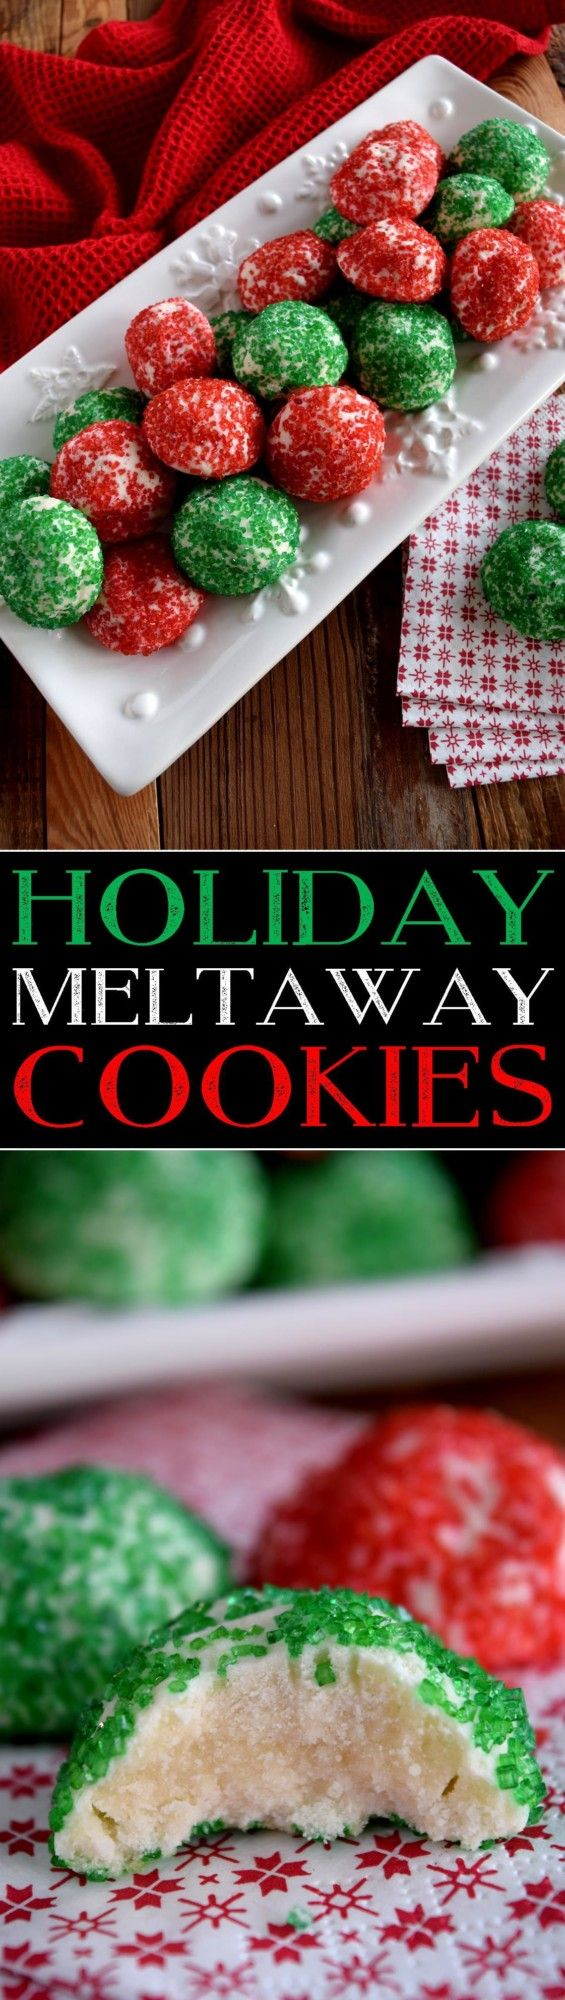 holiday-meltaway-cookies